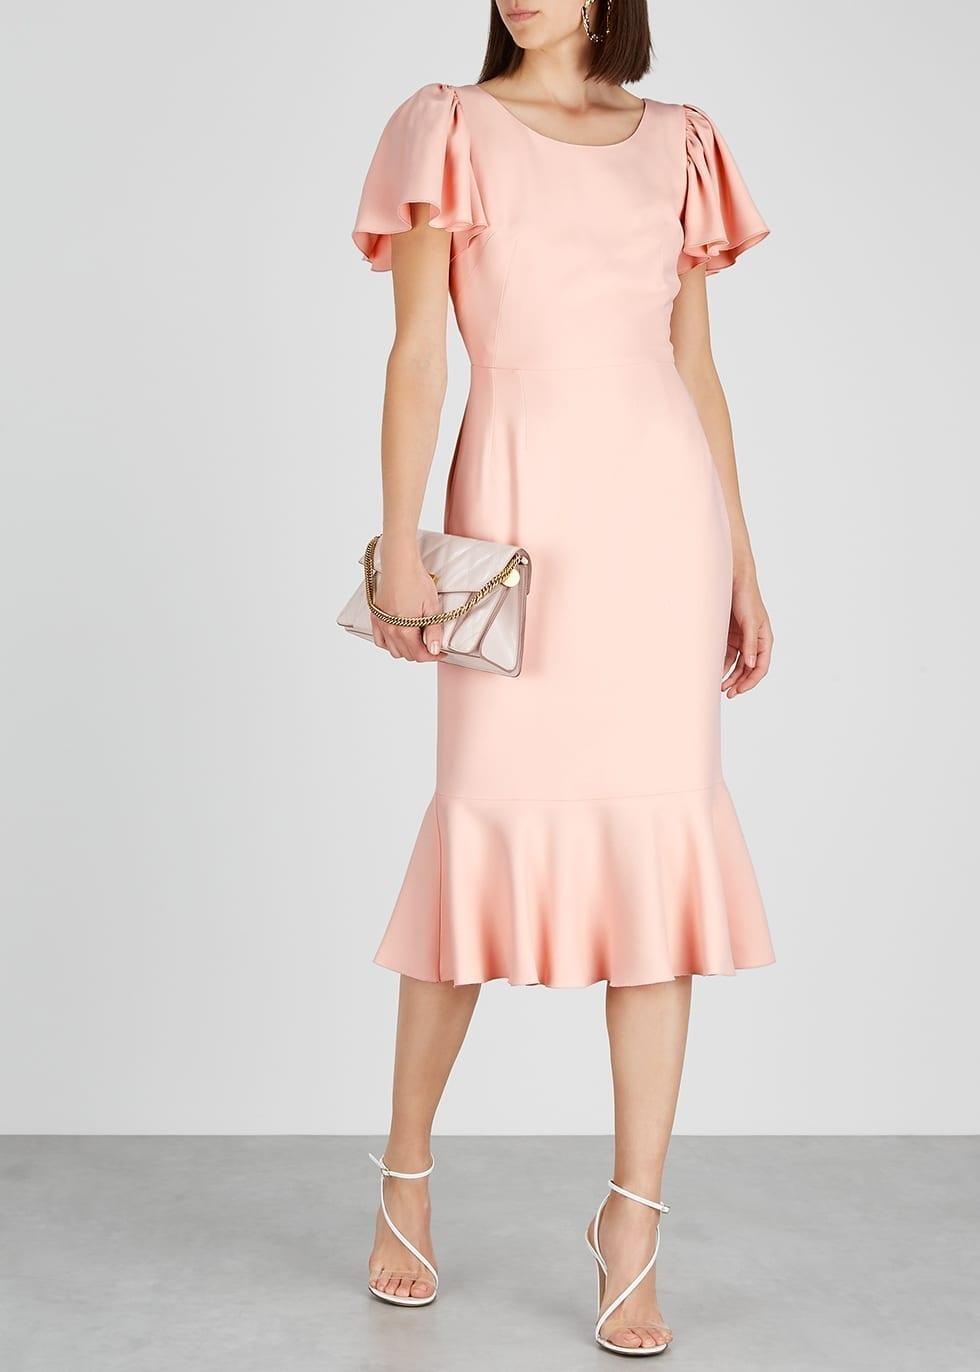 DOLCE & GABBANA Pink Ruffled Cady Dress